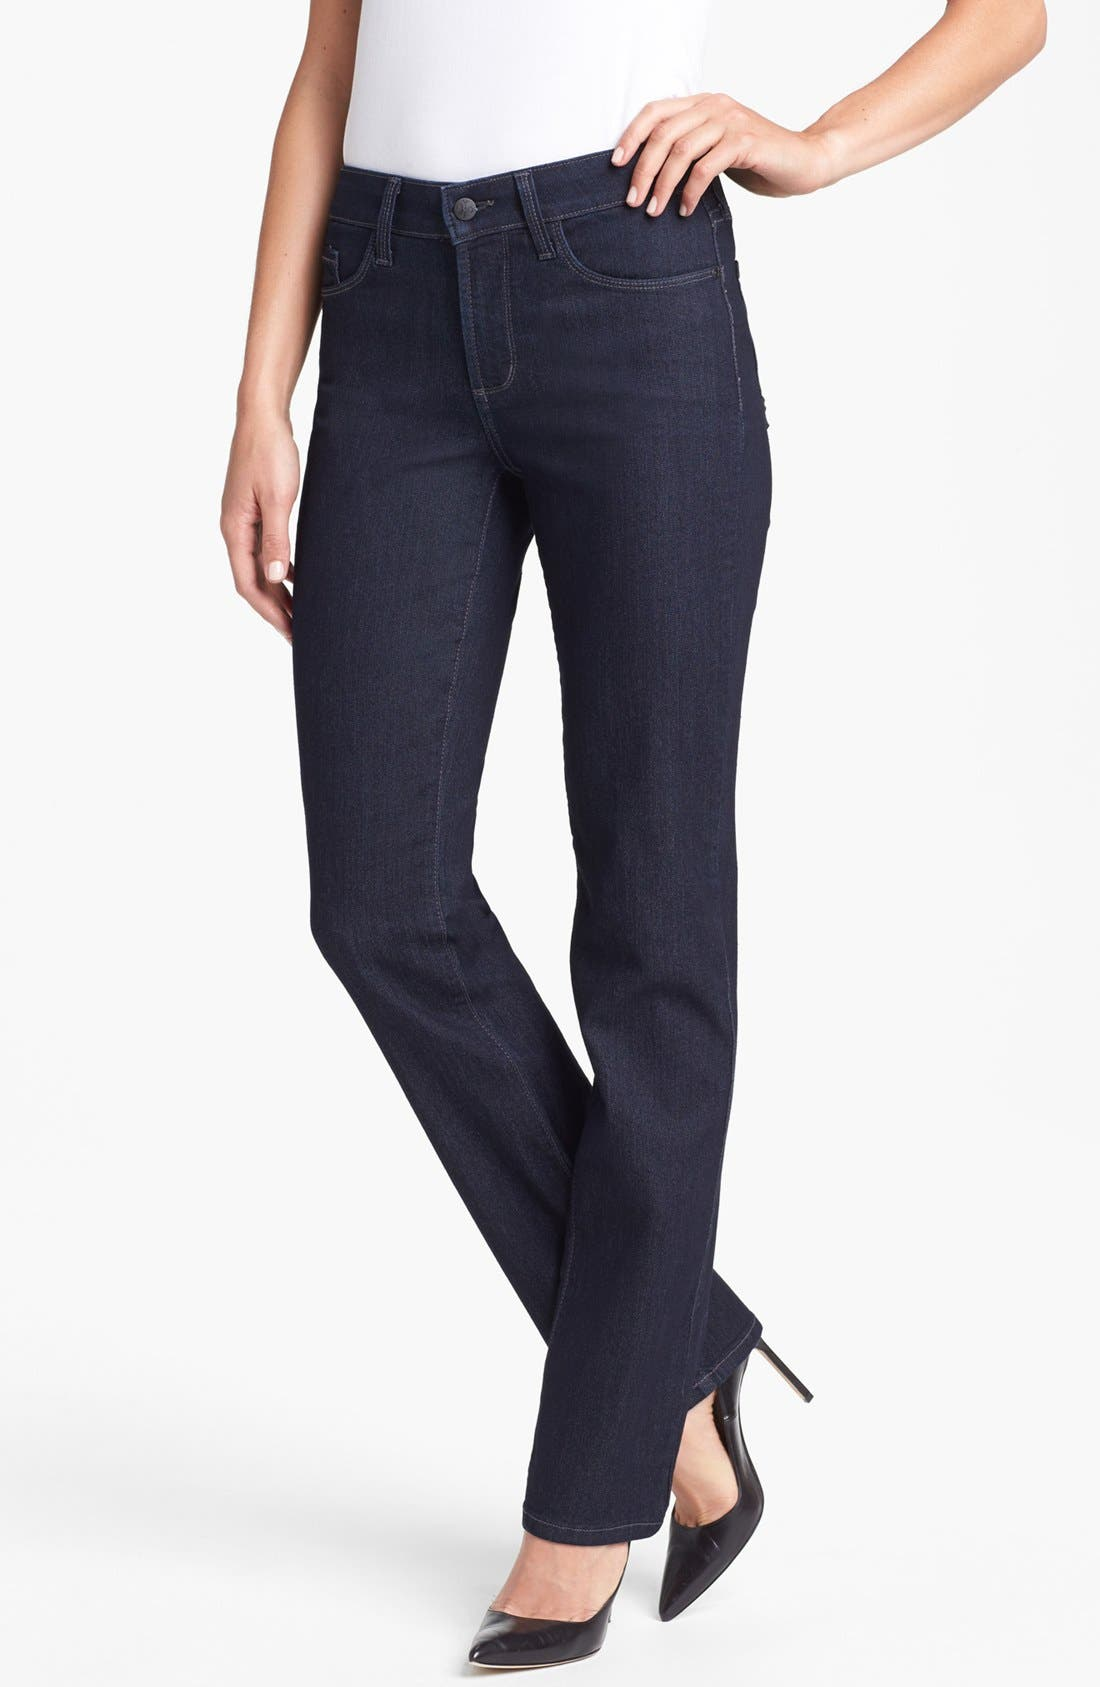 Alternate Image 1 Selected - NYDJ 'Marilyn' Embellished Pocket Stretch Straight Leg Jeans (Dark Enzyme) (Regular & Petite)